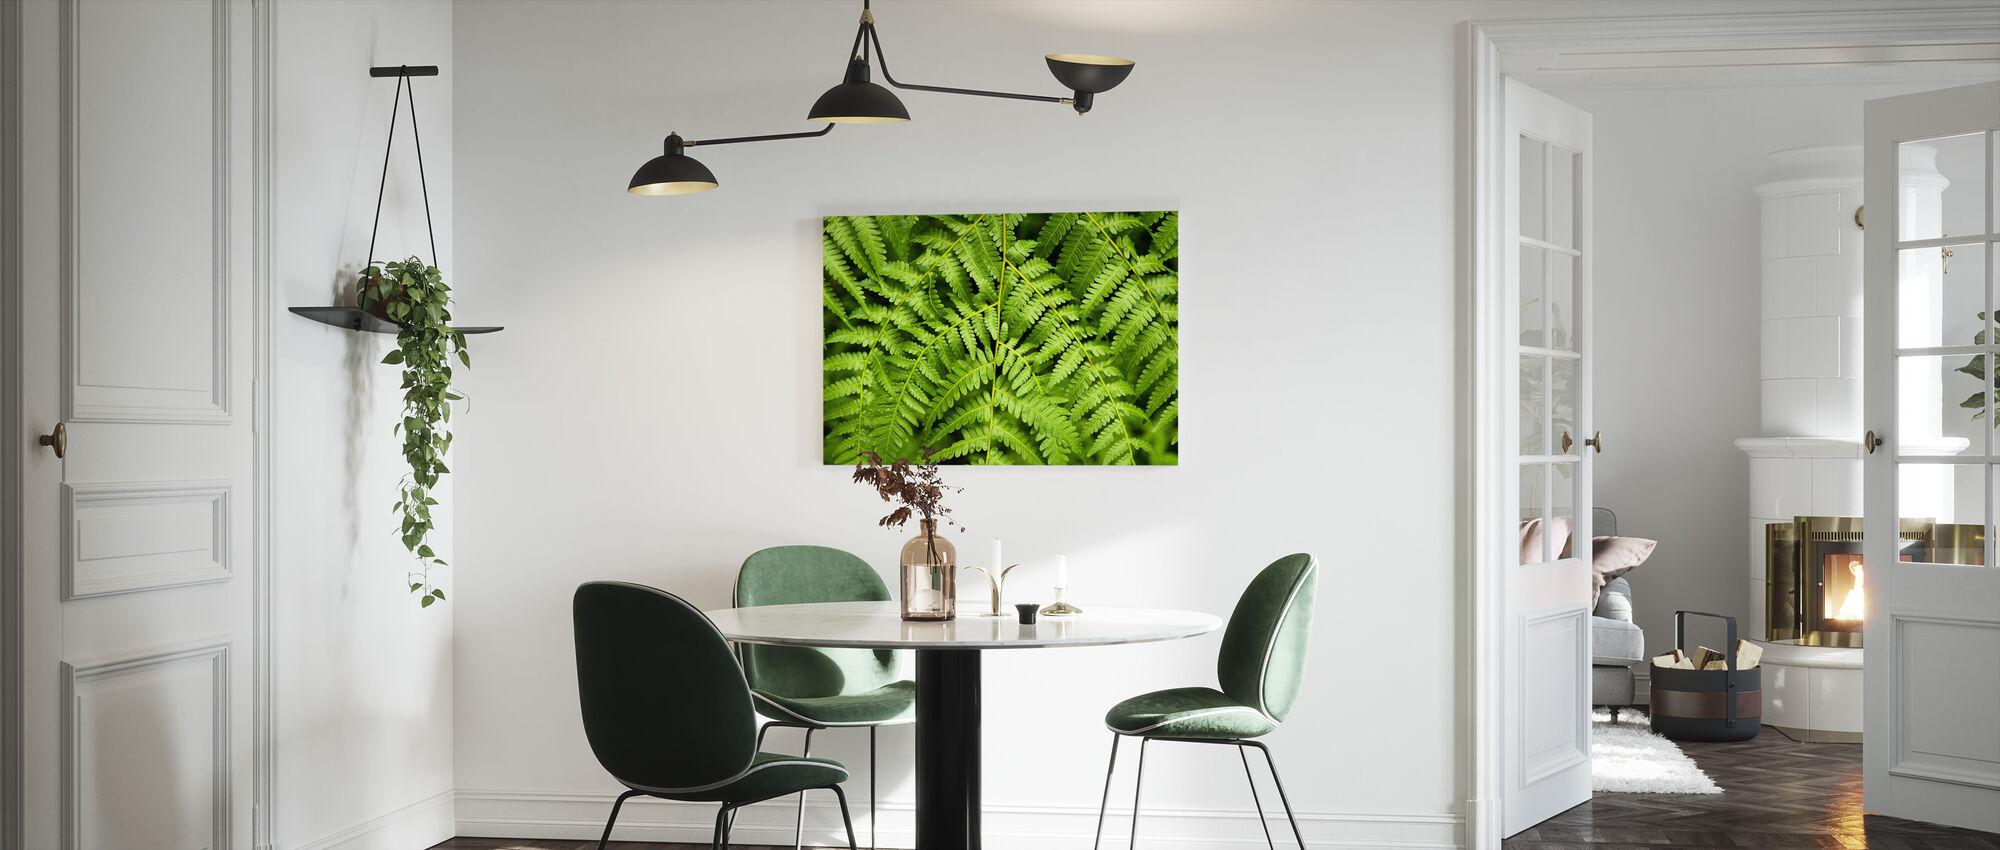 Greenery Ferns - Canvas print - Kitchen